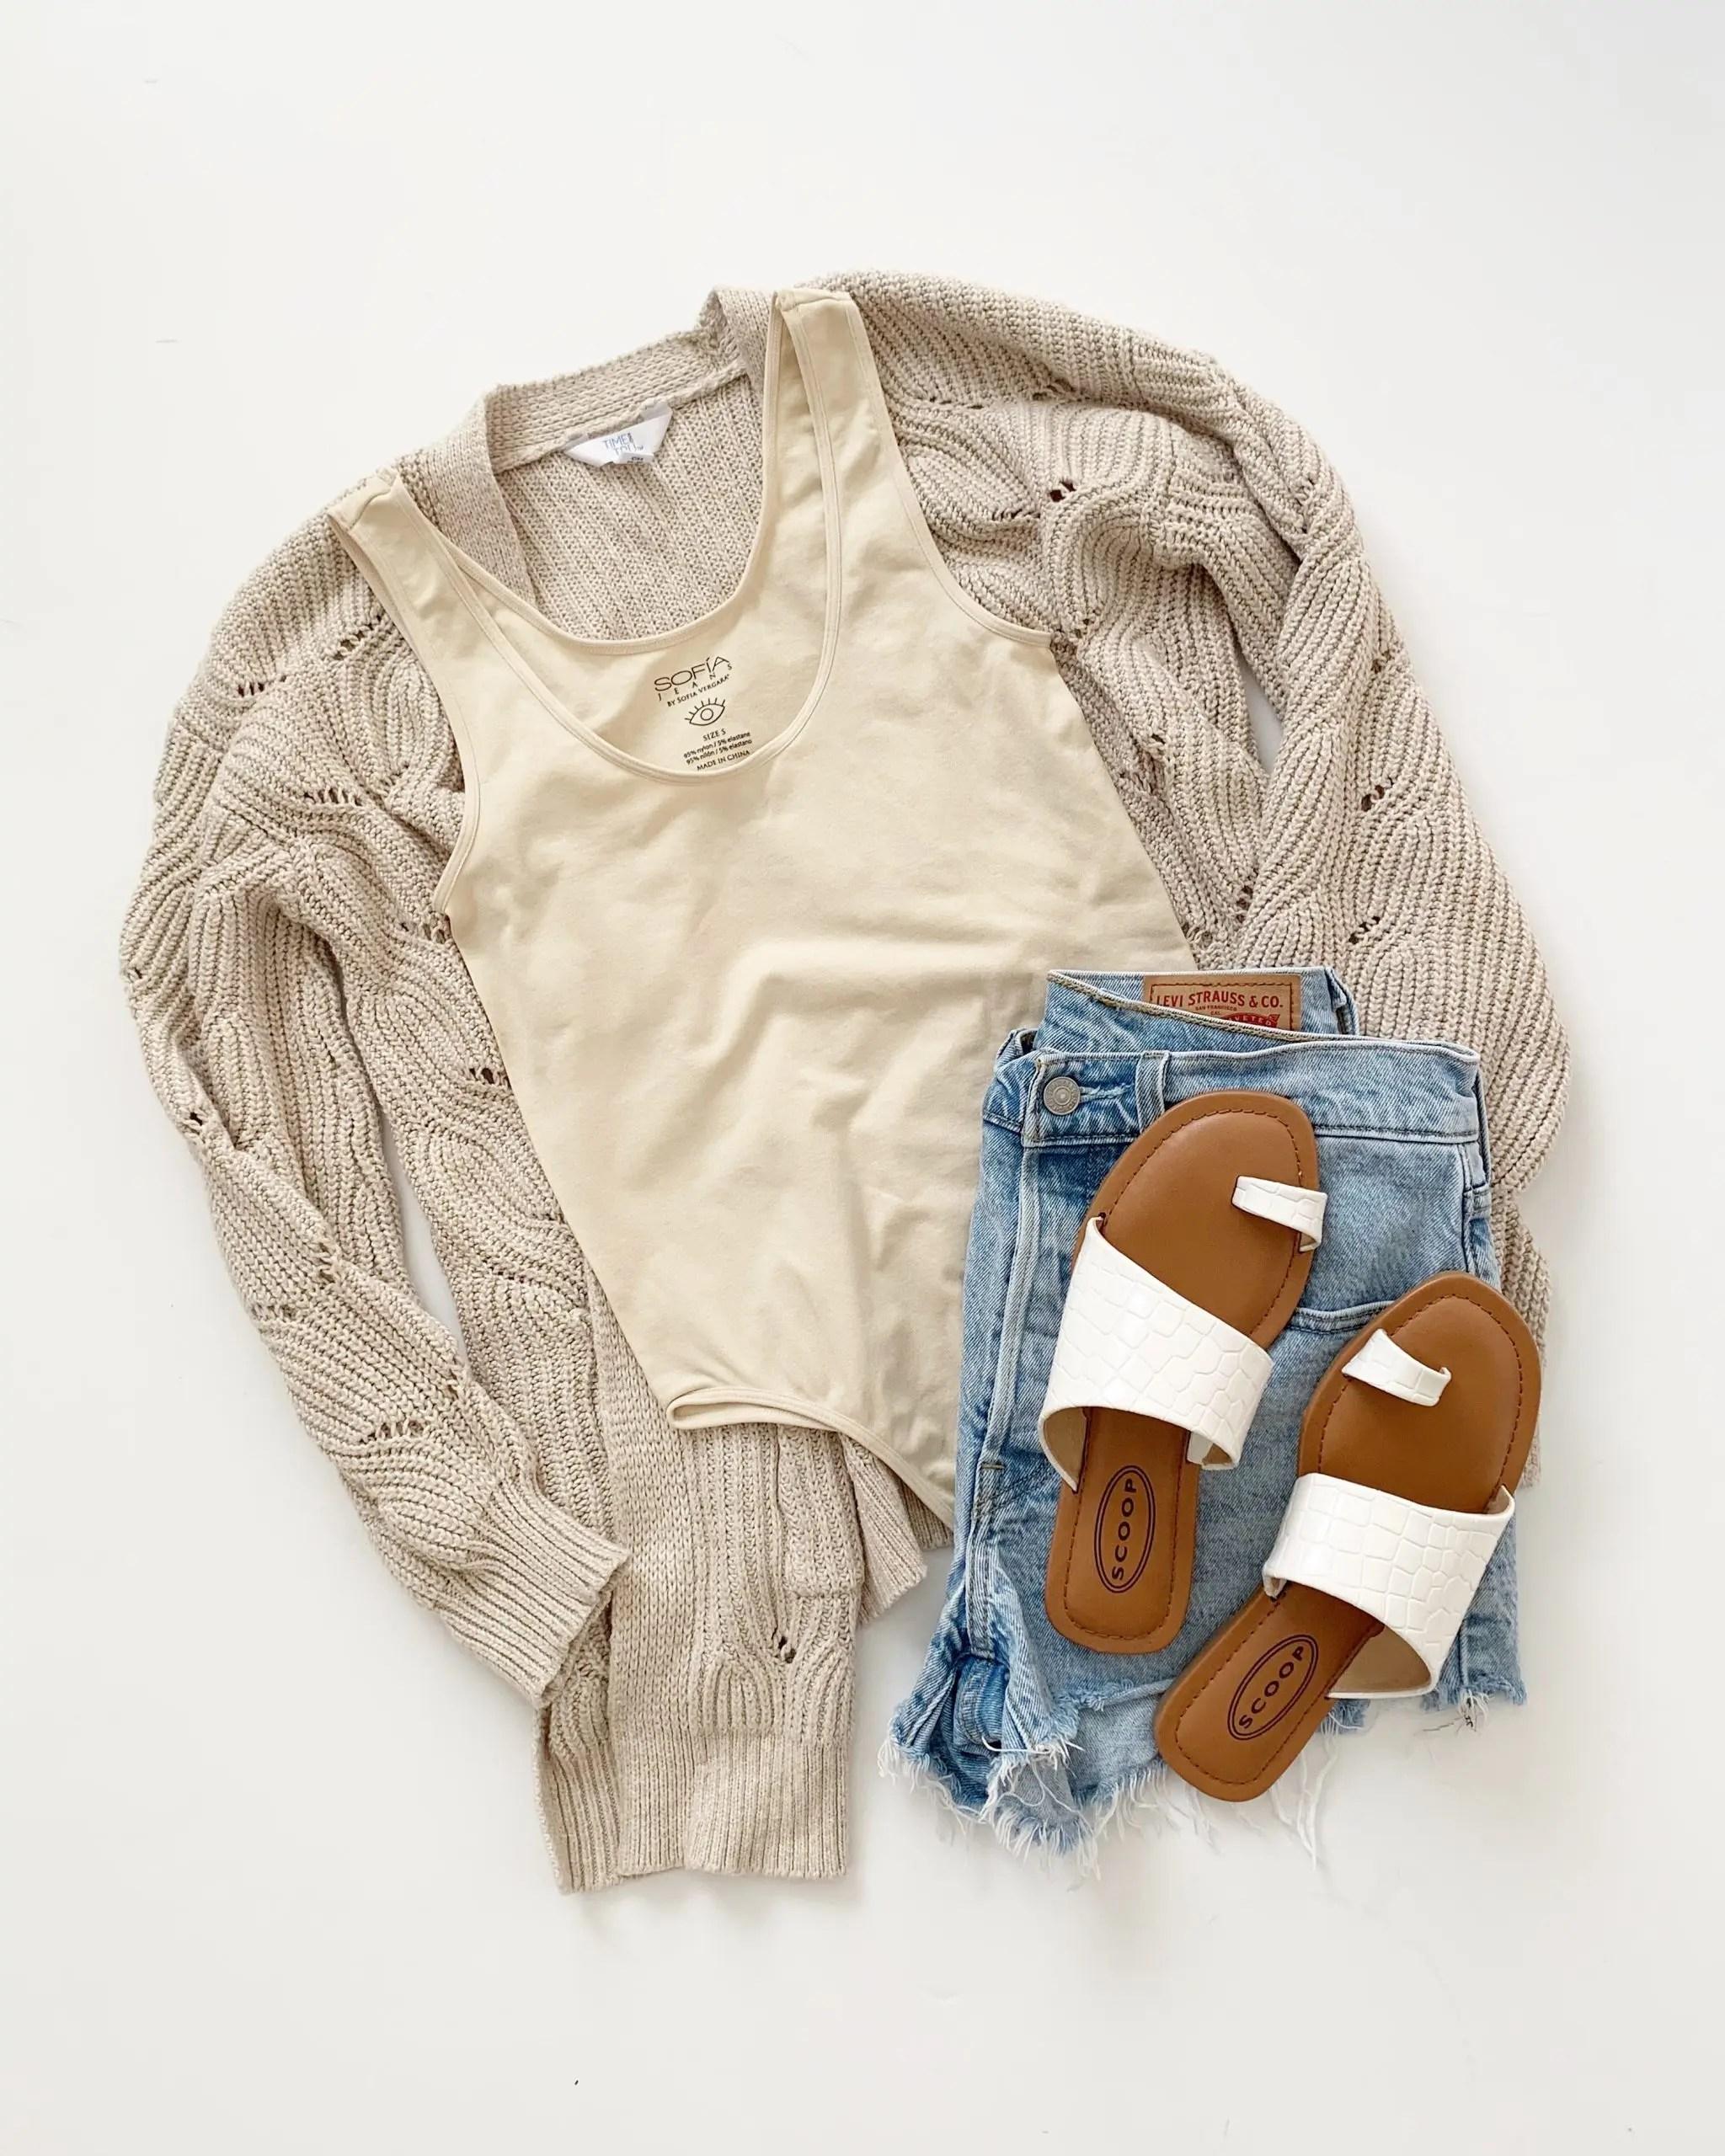 sofia vergara scoop neck tank bodysuit - scoop sandals, levi's 501 shorts , time and tru cardigan